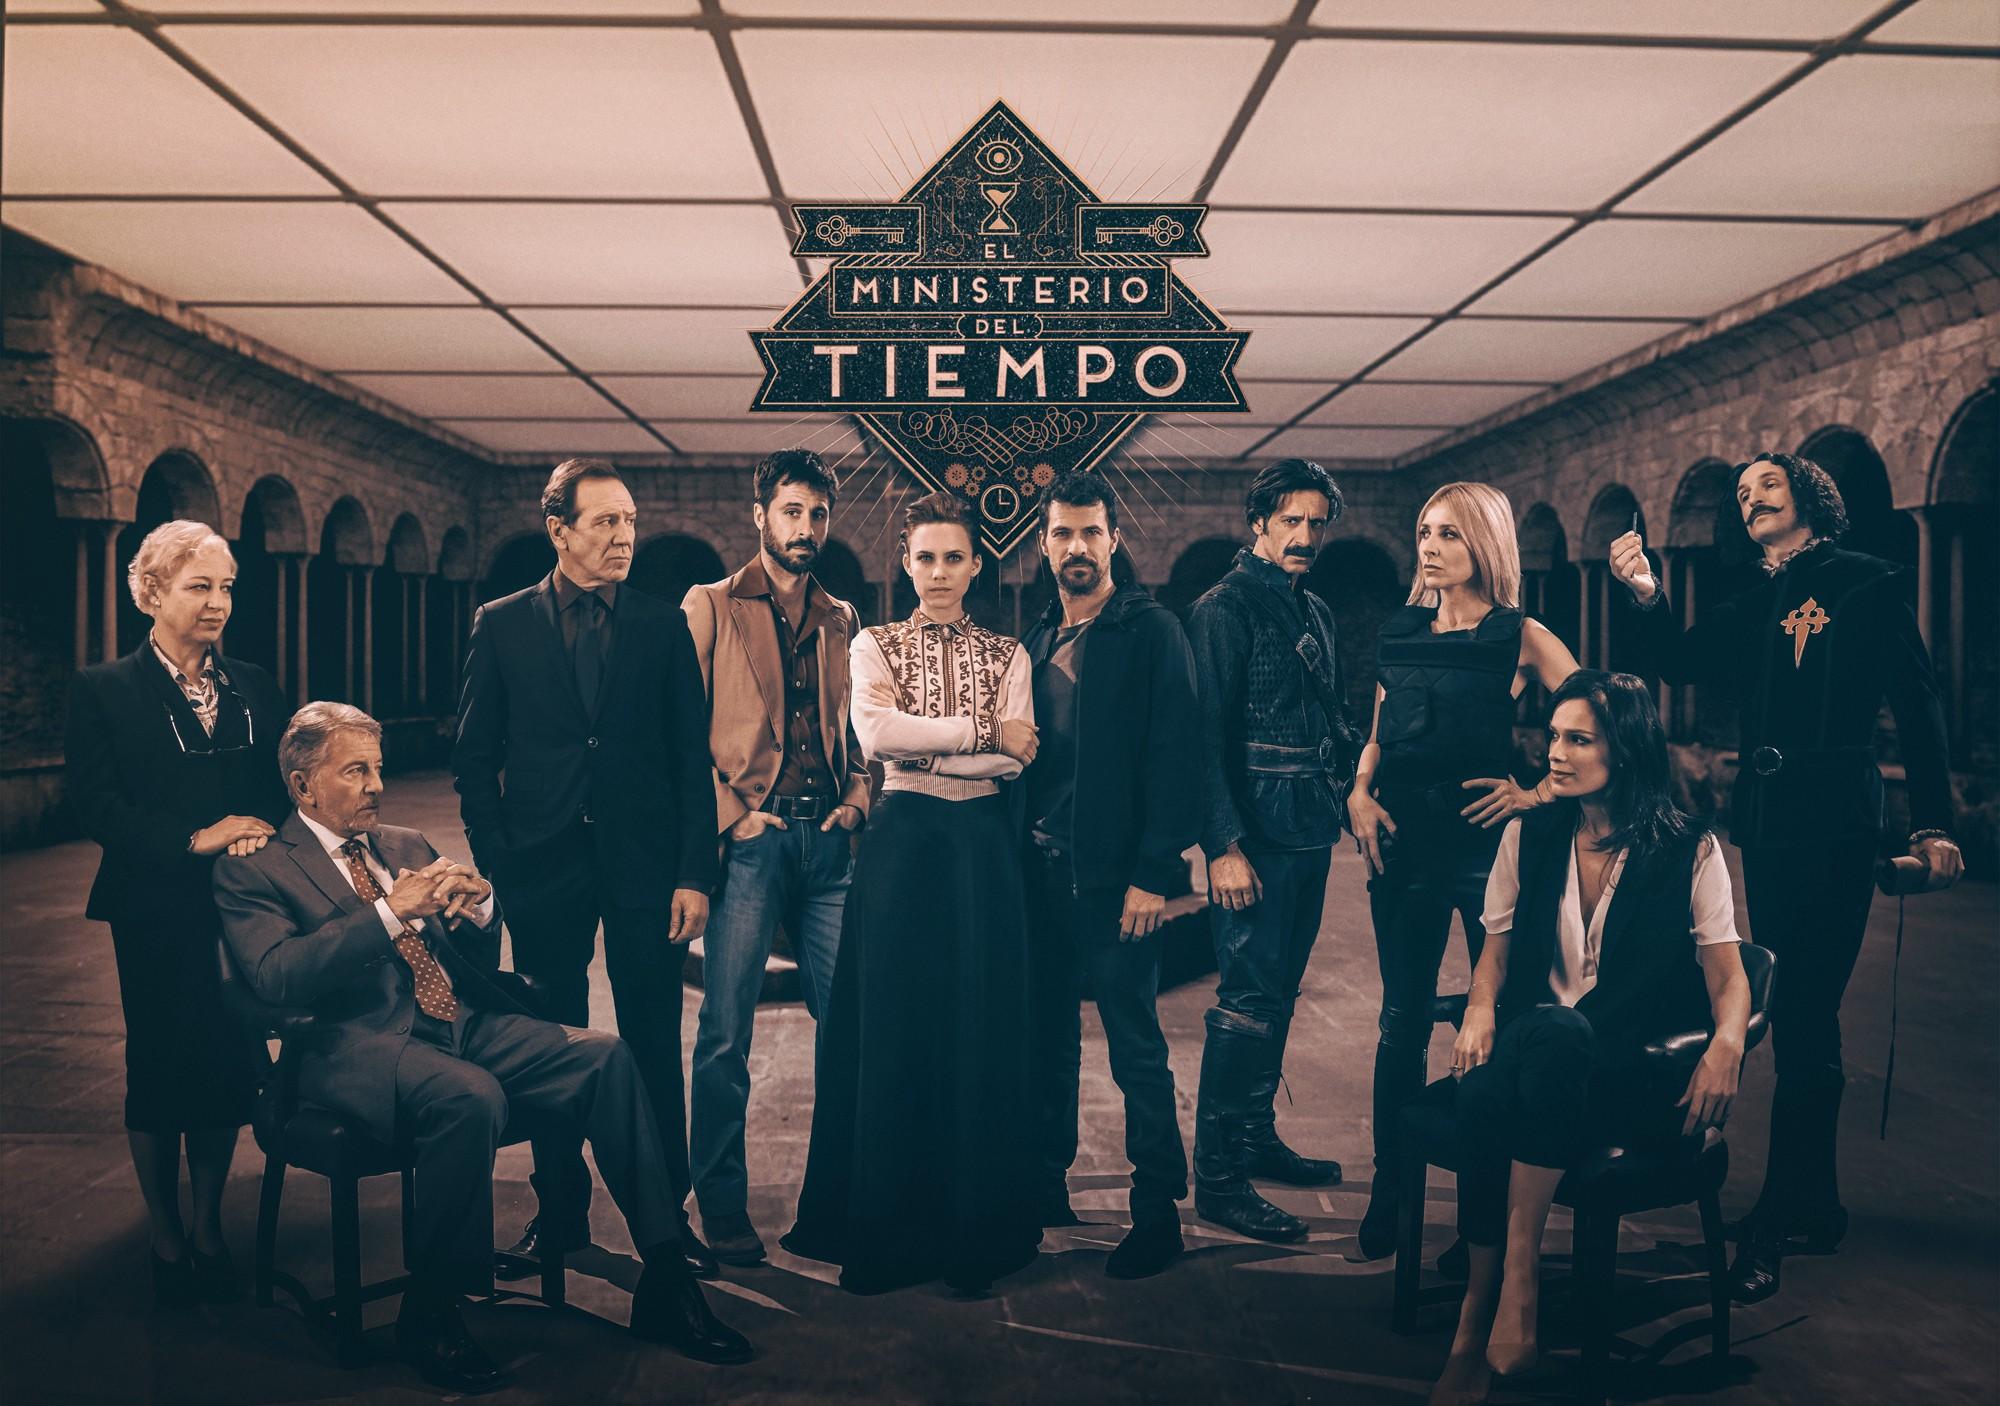 CINEMA OMICRON: El ministerio del tiempo